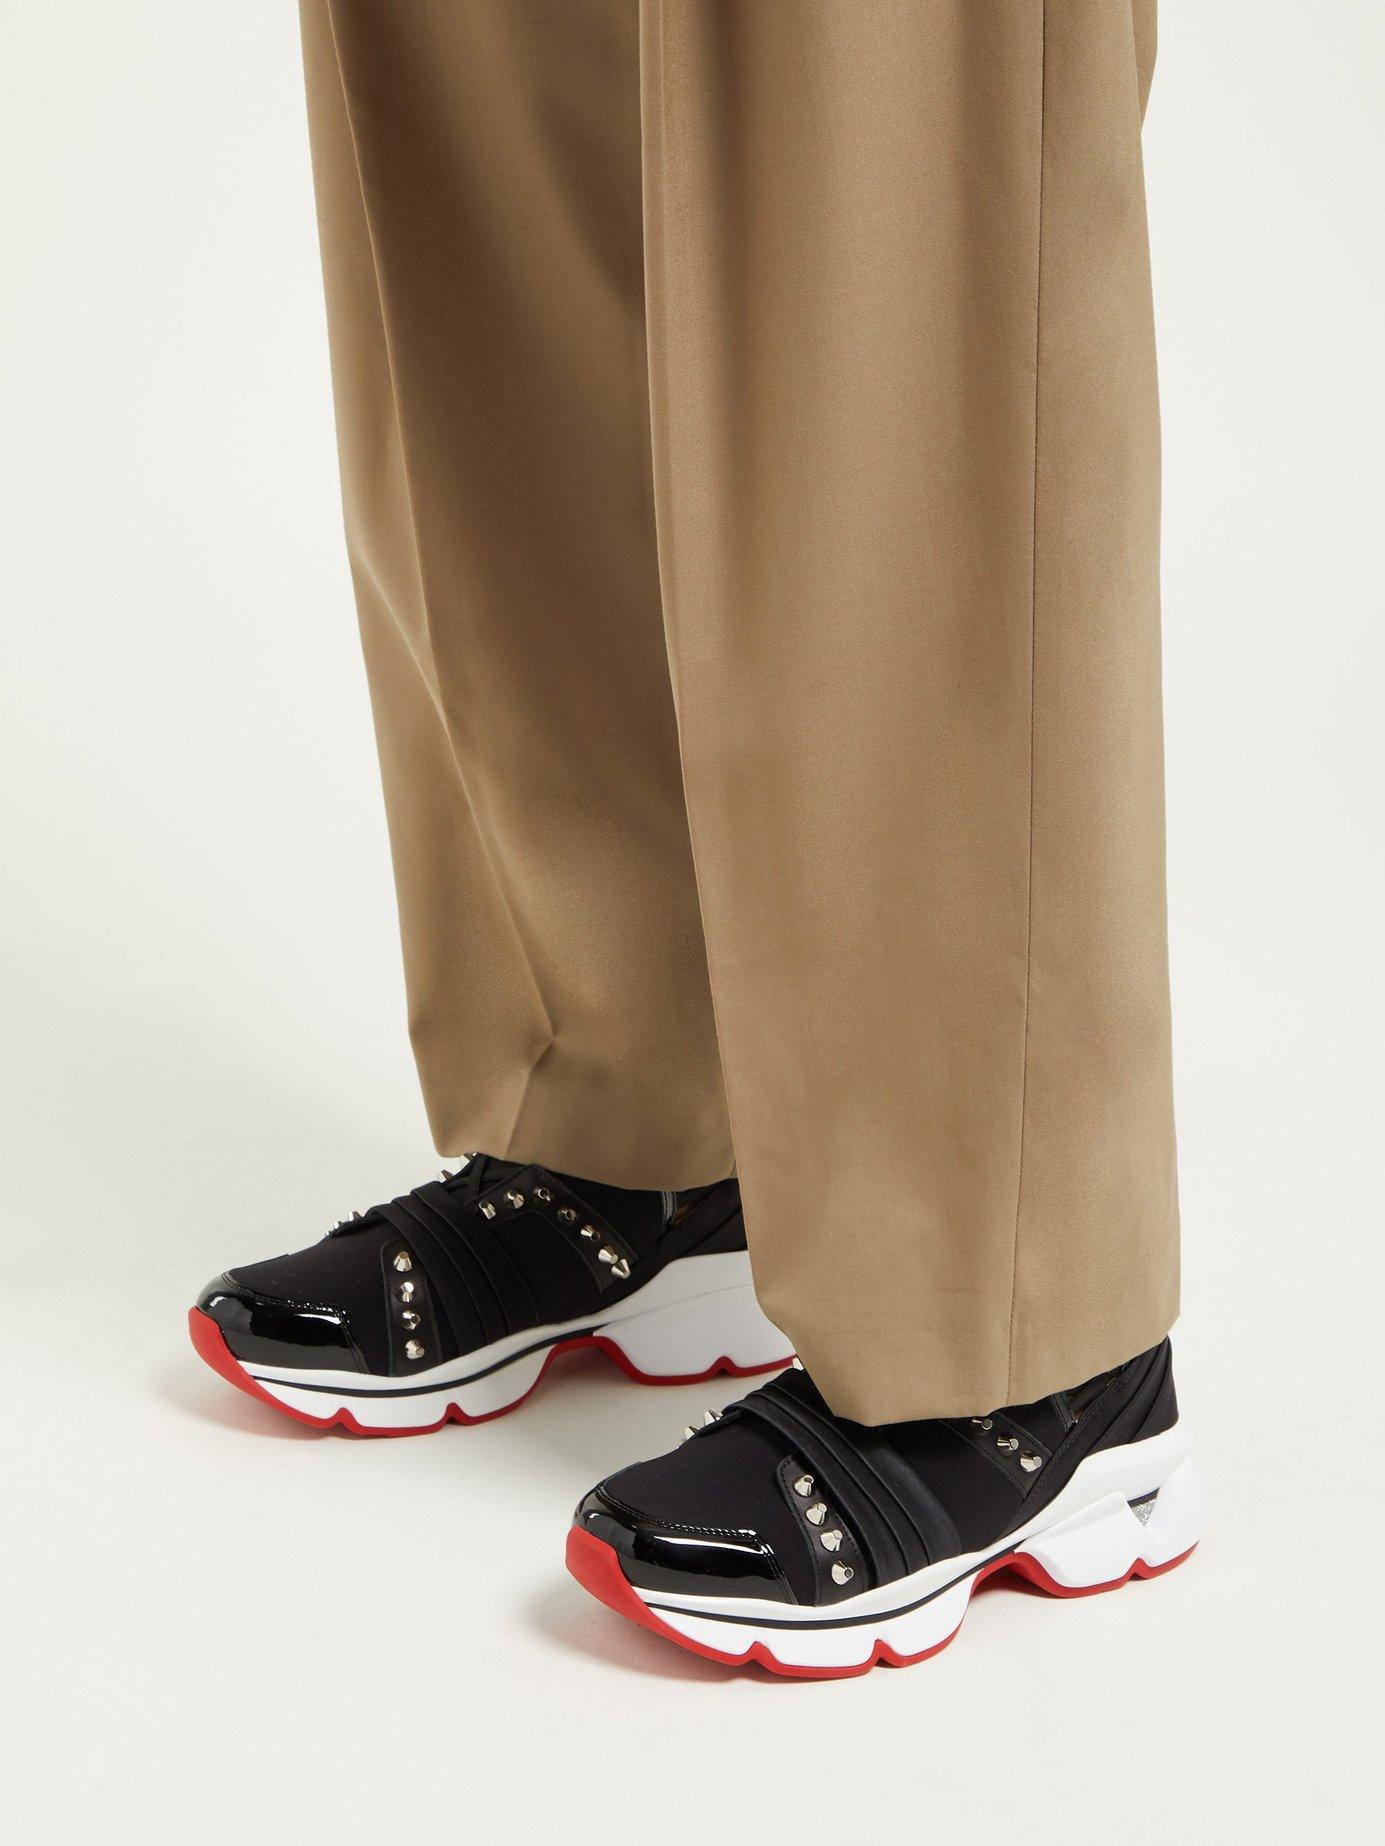 cb498707714 Women's Black 123 Run Studded Low Top Sneakers